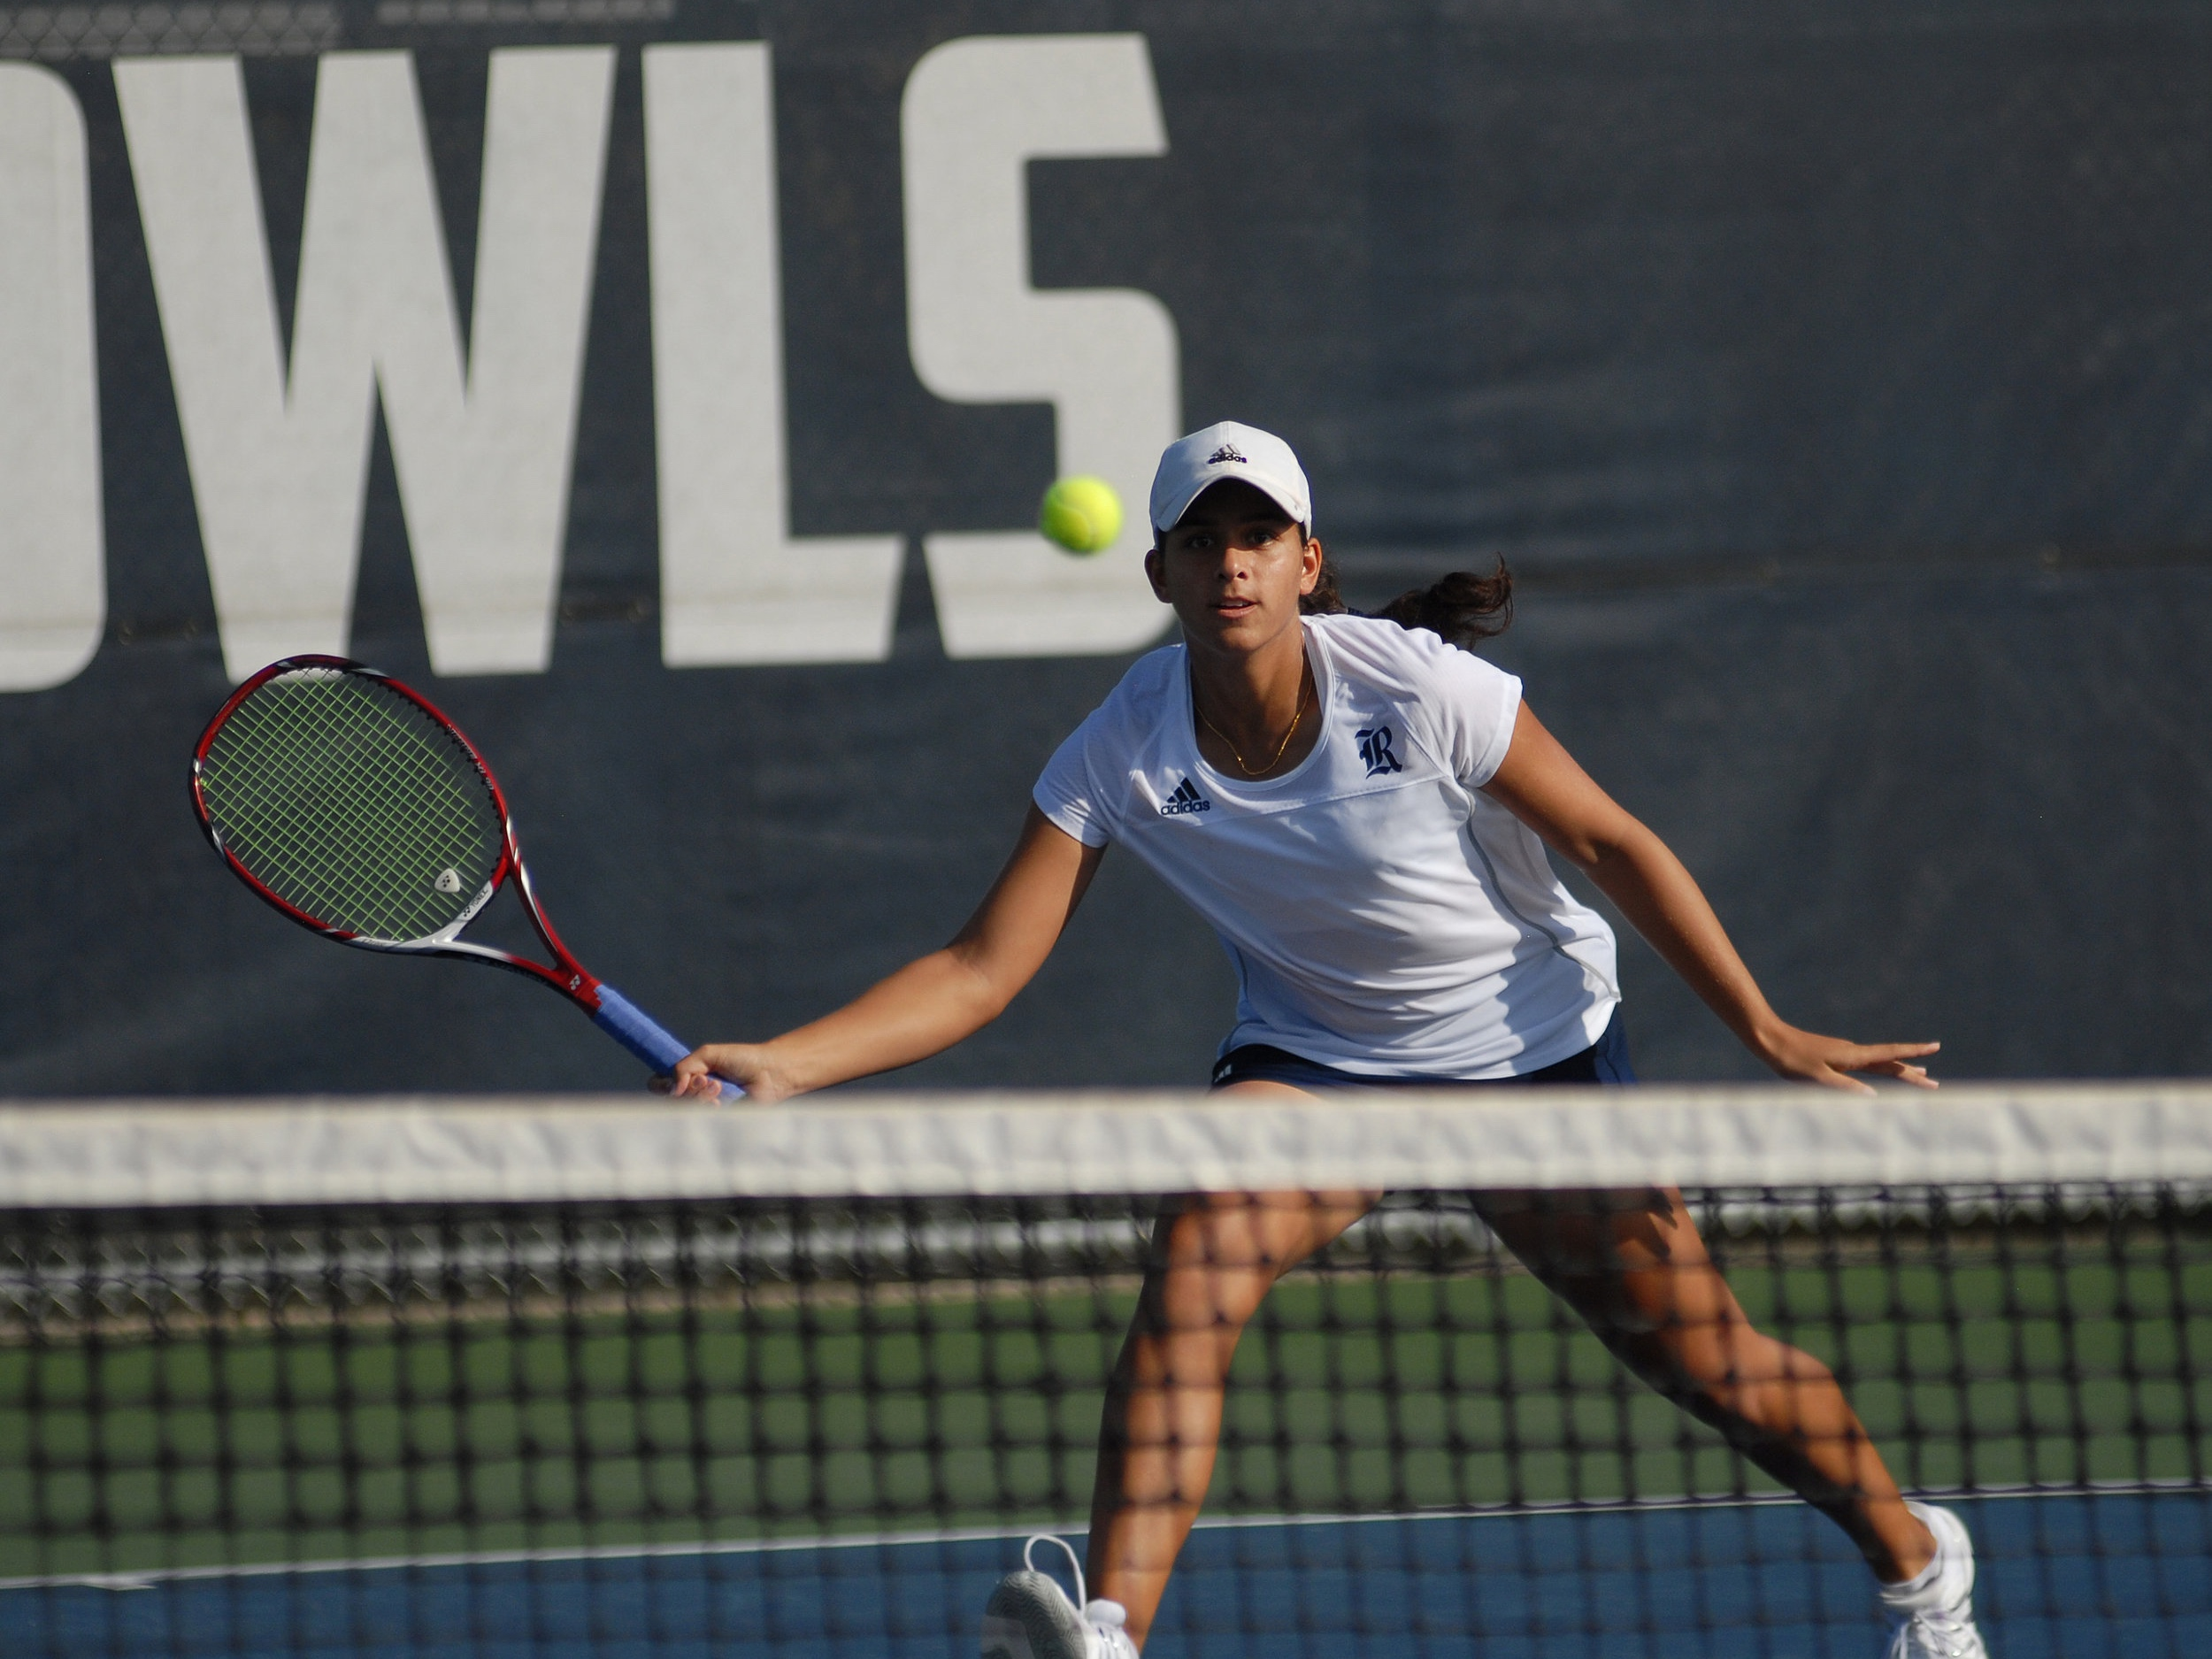 Priya Niezgoda - Tennis, Rice University